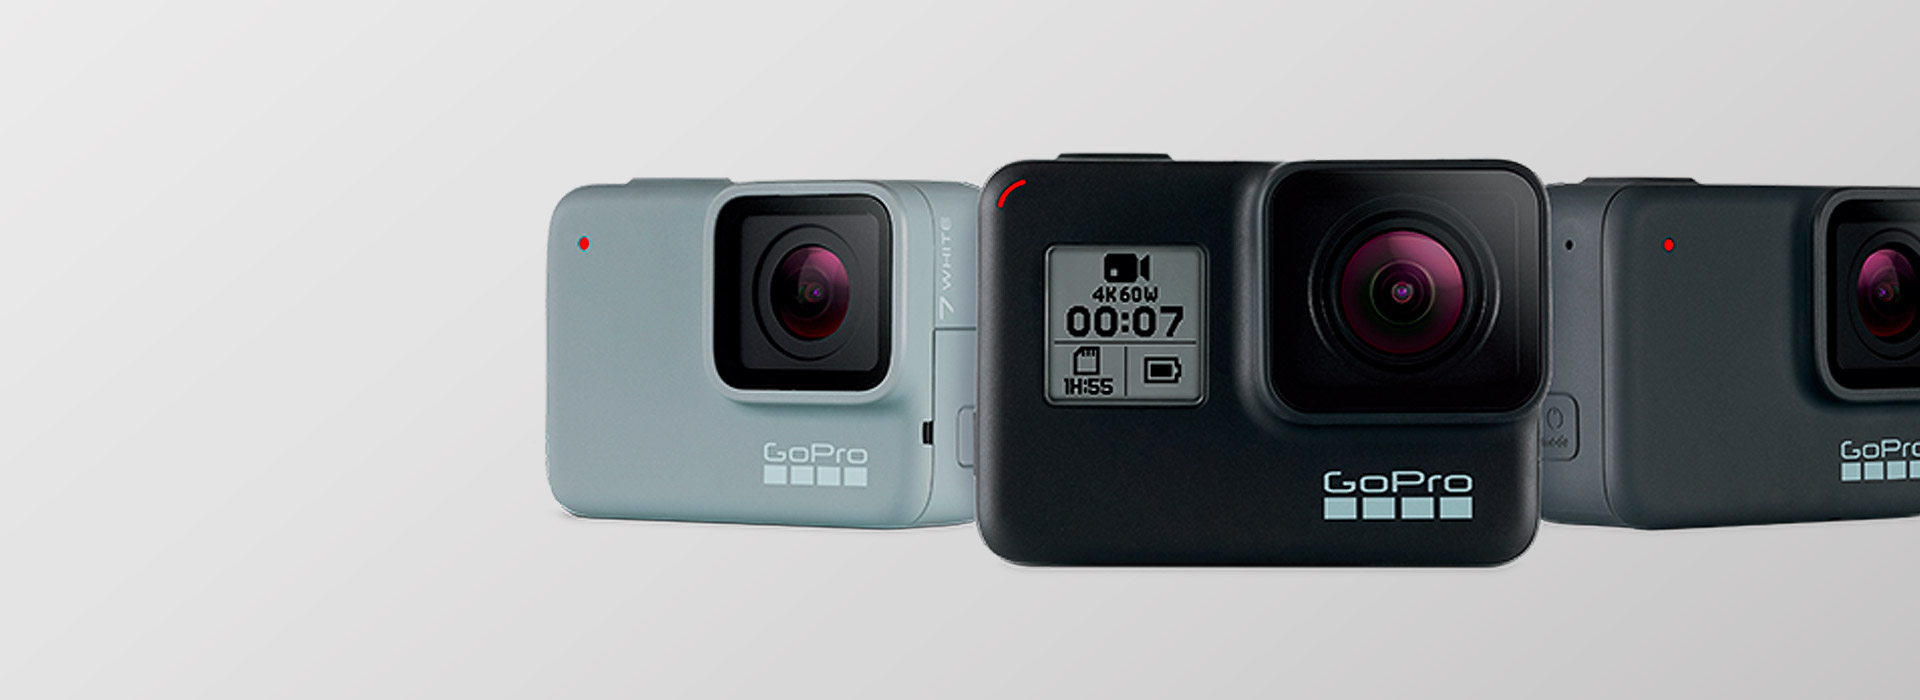 GoPro HERO 7 videocamera